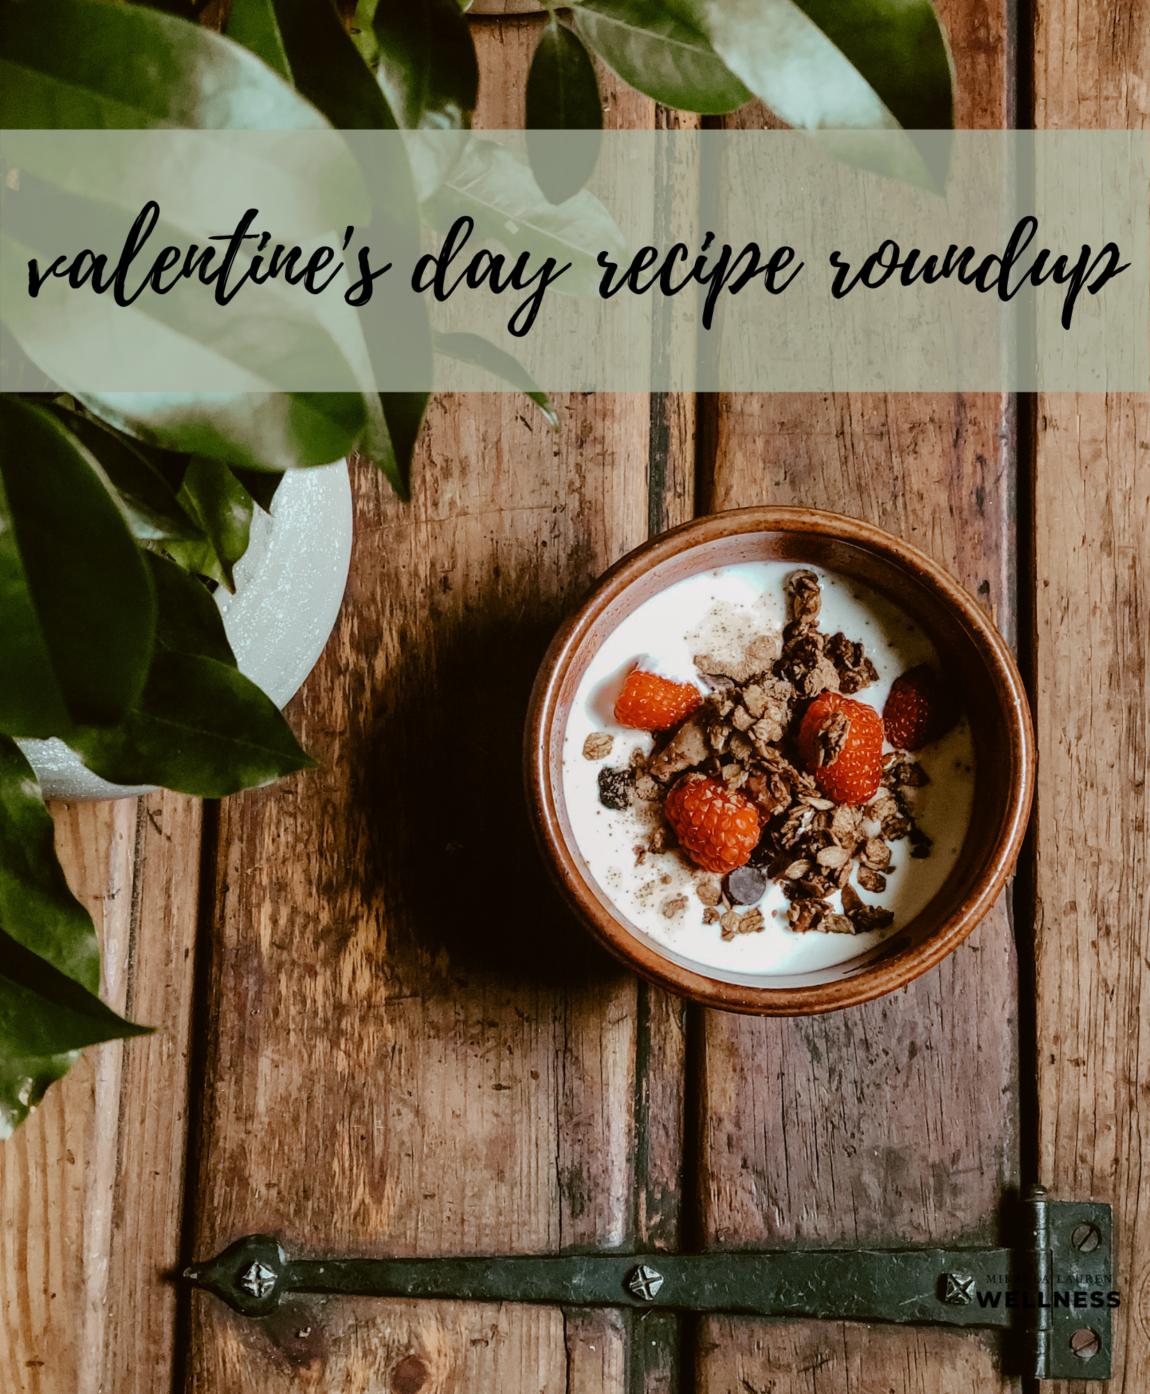 Valentines-day-recipe-roundup